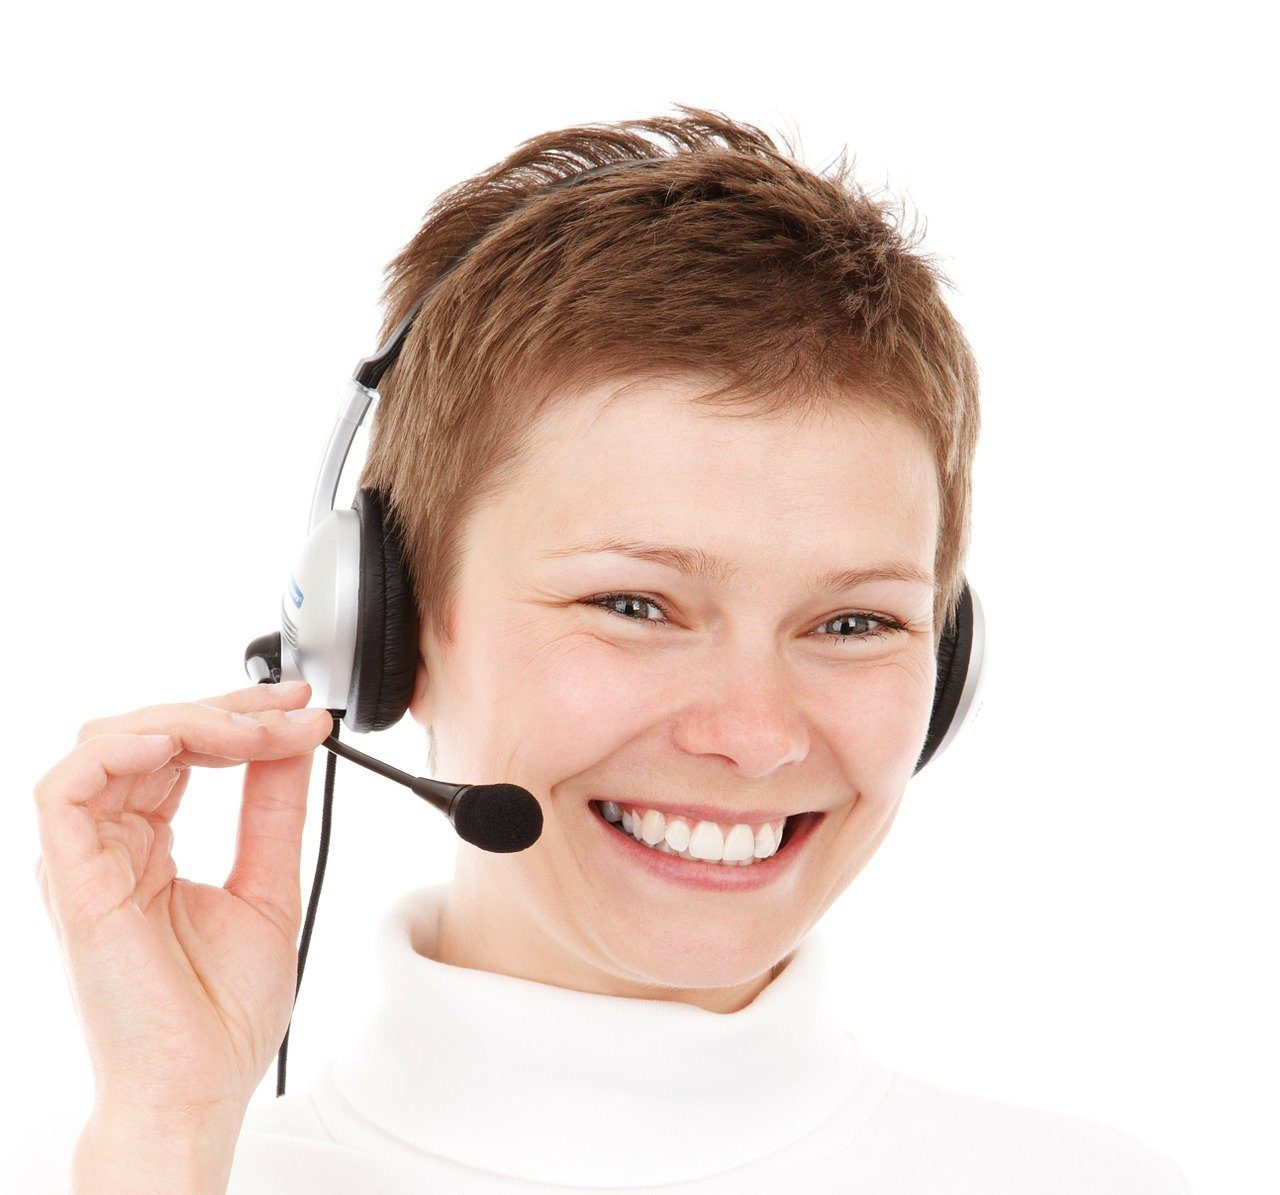 Back-office facilities, call centers flourishing across Western New York